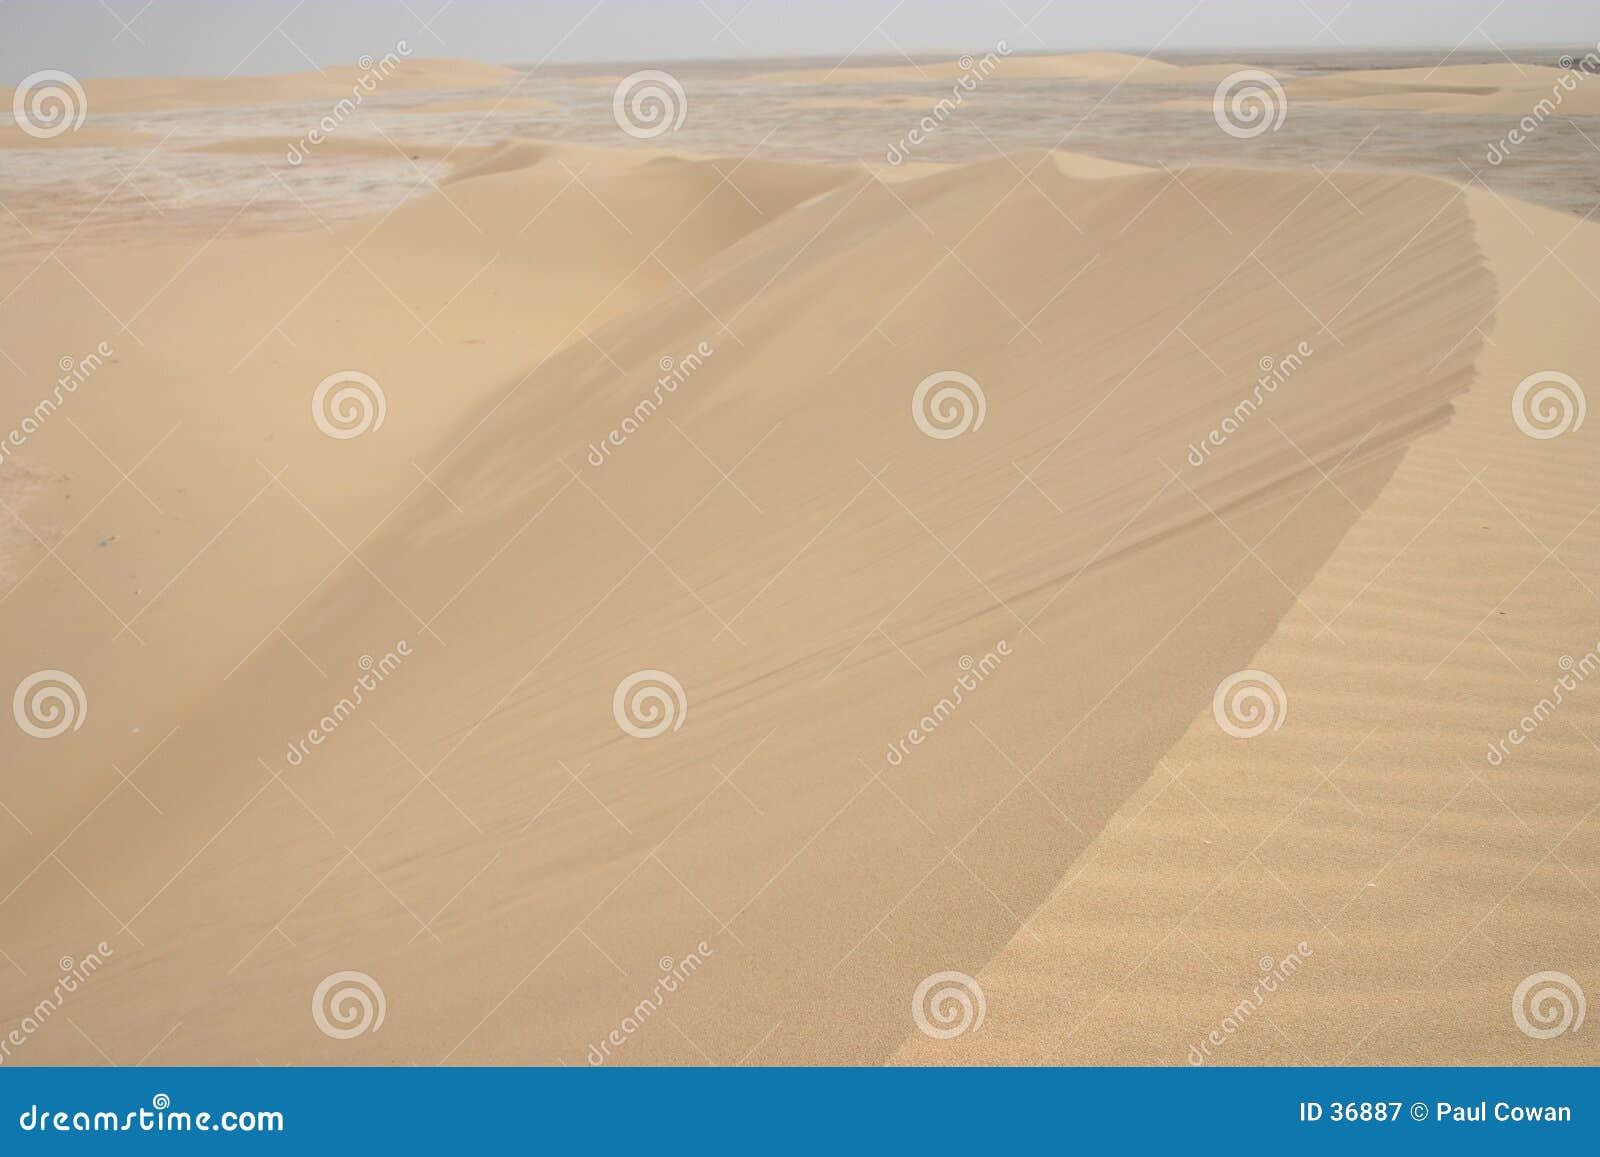 Arabian sandstorm